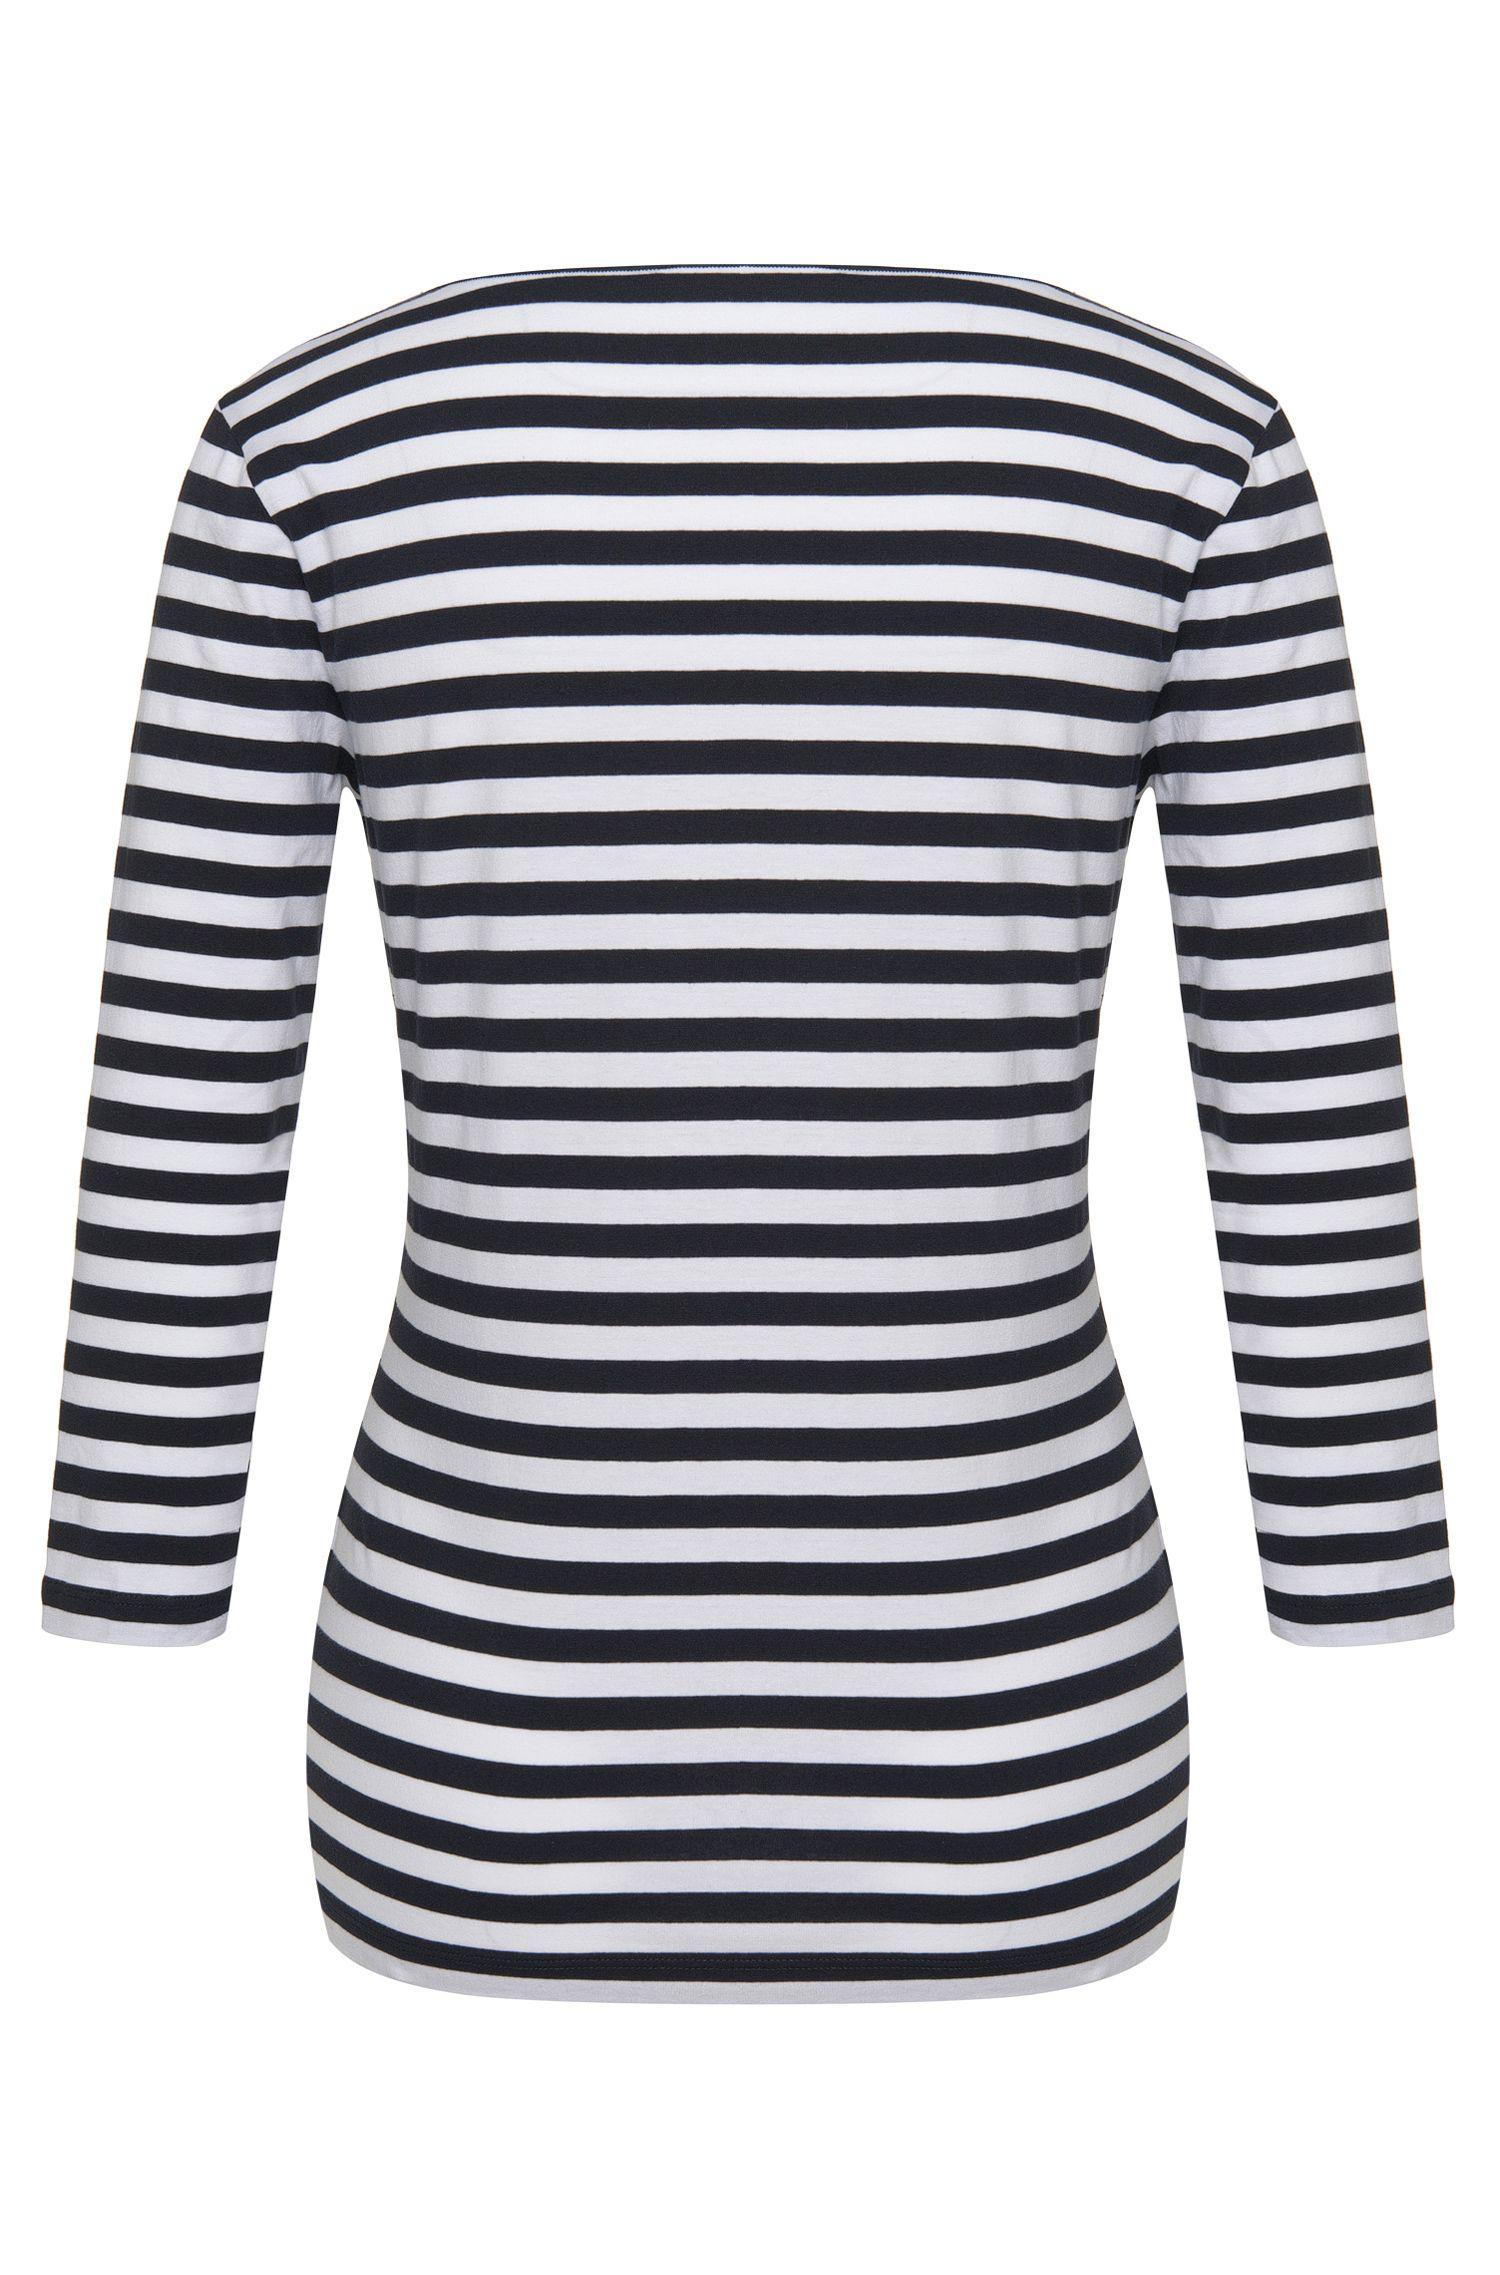 Gestreiftes Shirt aus Stretch-Baumwolle: 'E4513'